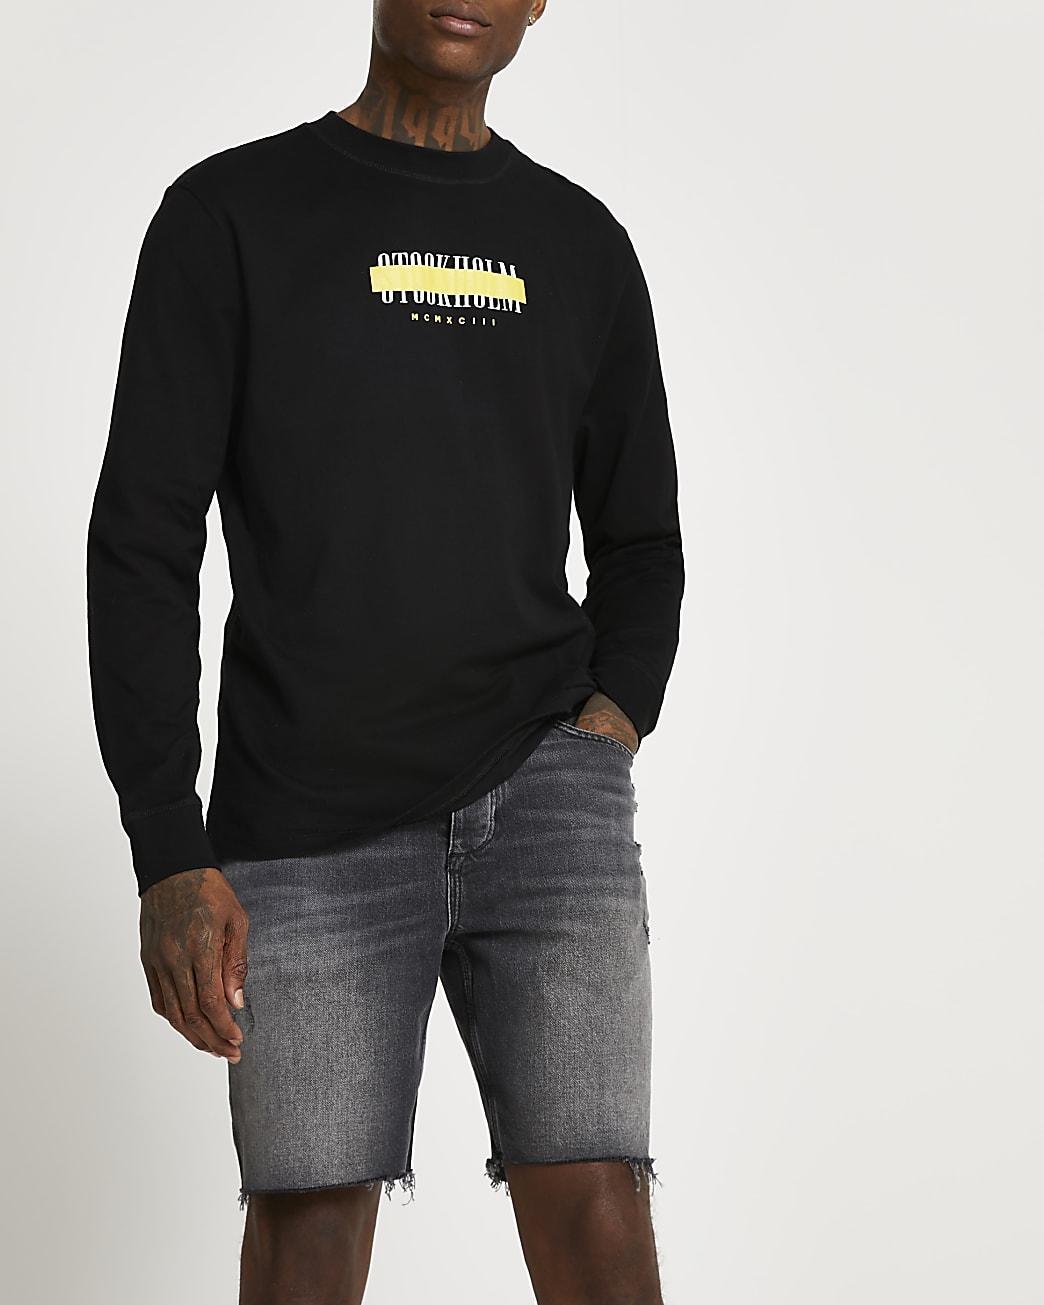 Black graphic regular fit long sleeve t-shirt